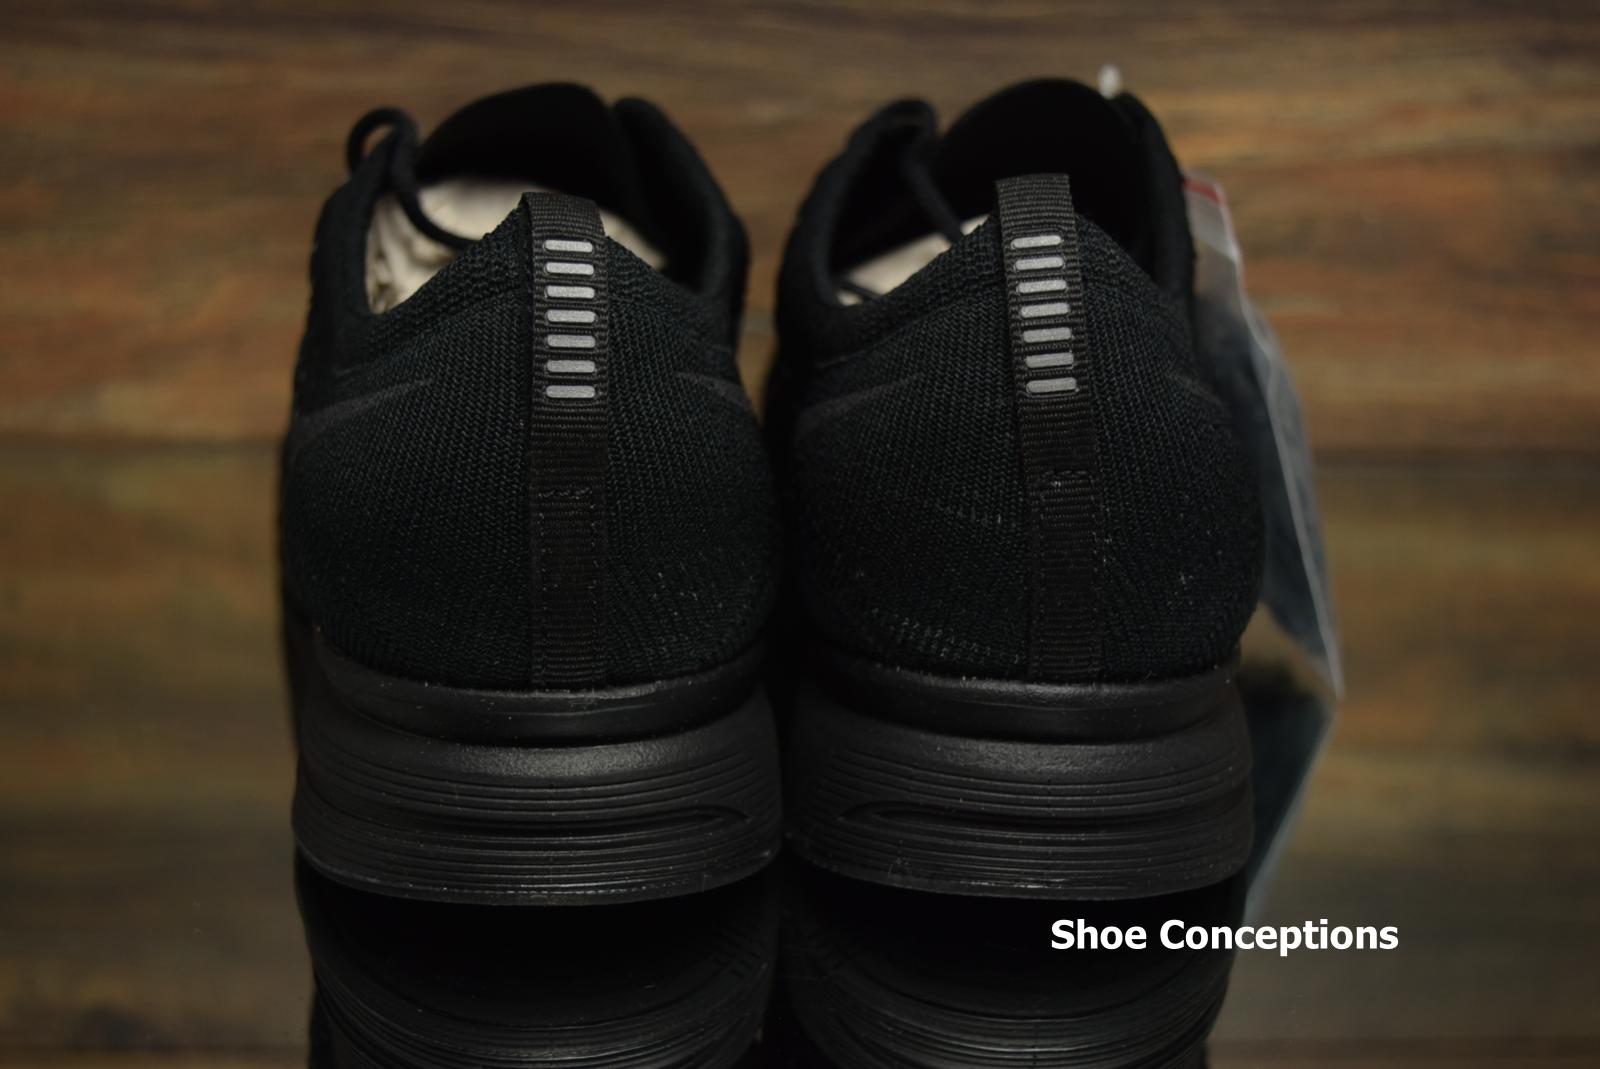 nike chaussure 881805-102 flex expérience rn 6 femmes dirige chaussure nike sz 12 9cf3c0